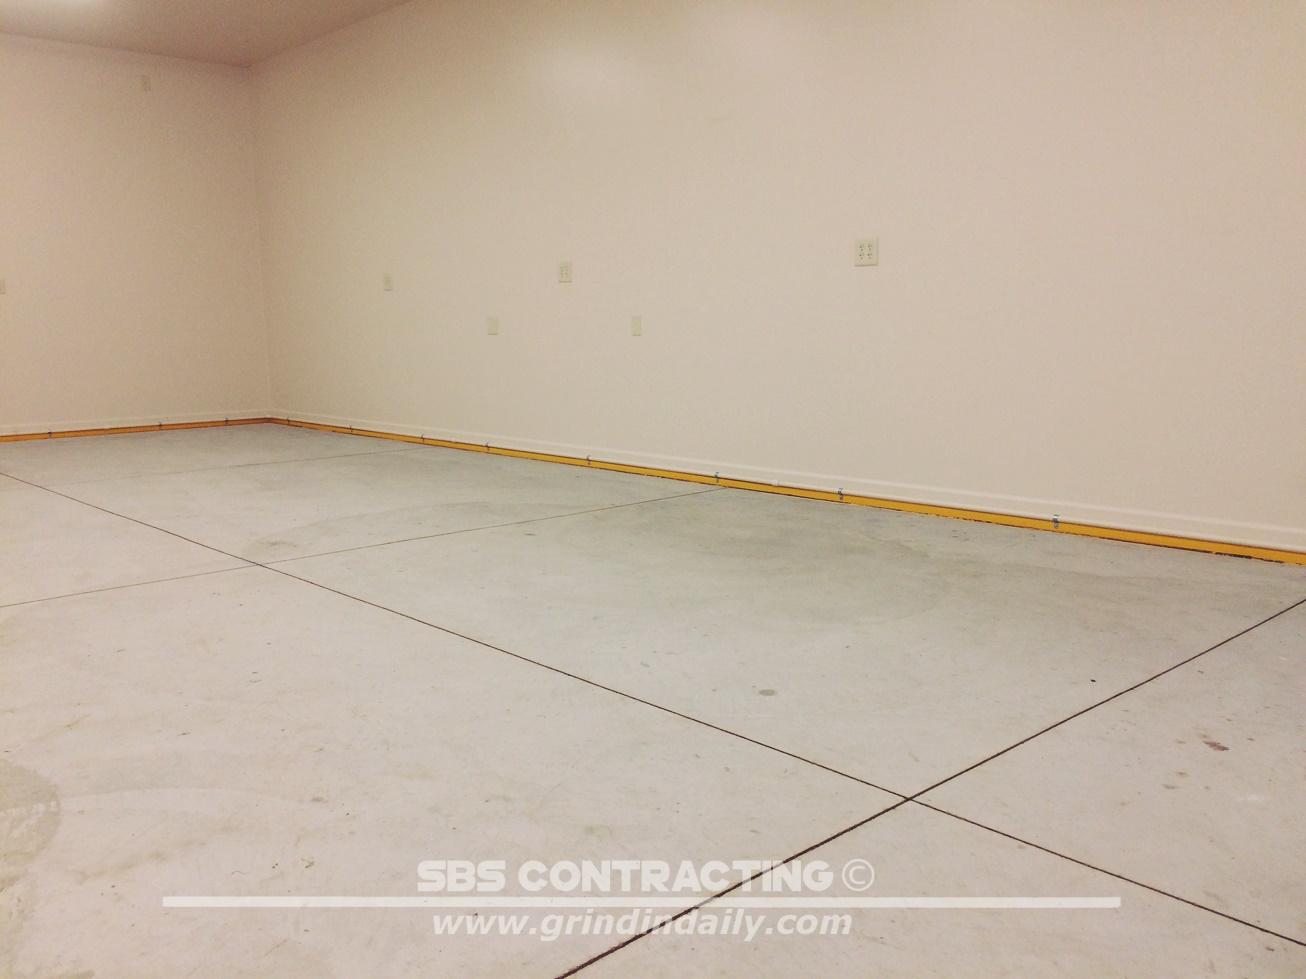 SBS-Contracting-Pole-Barn-Floor-Project-Before-01-2018-01